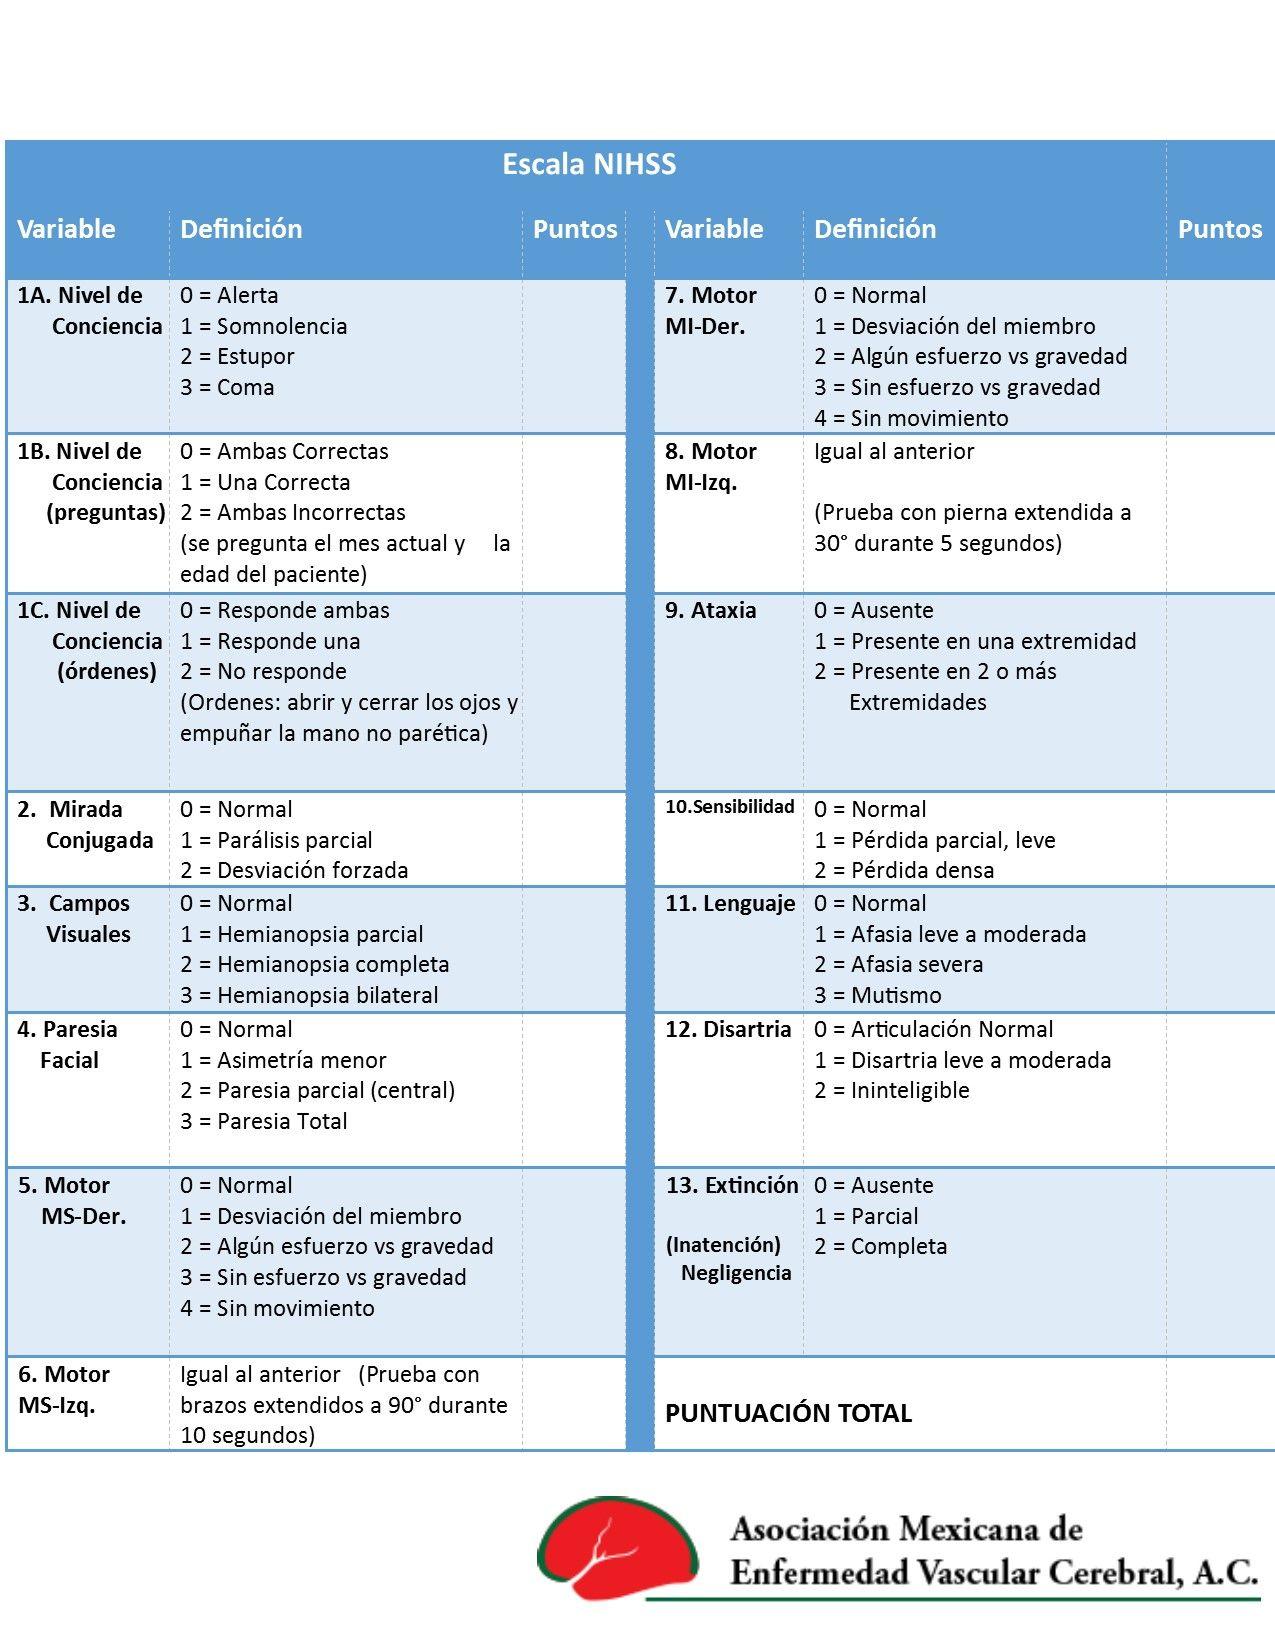 ESCALA DE NIHSS PDF DOWNLOAD